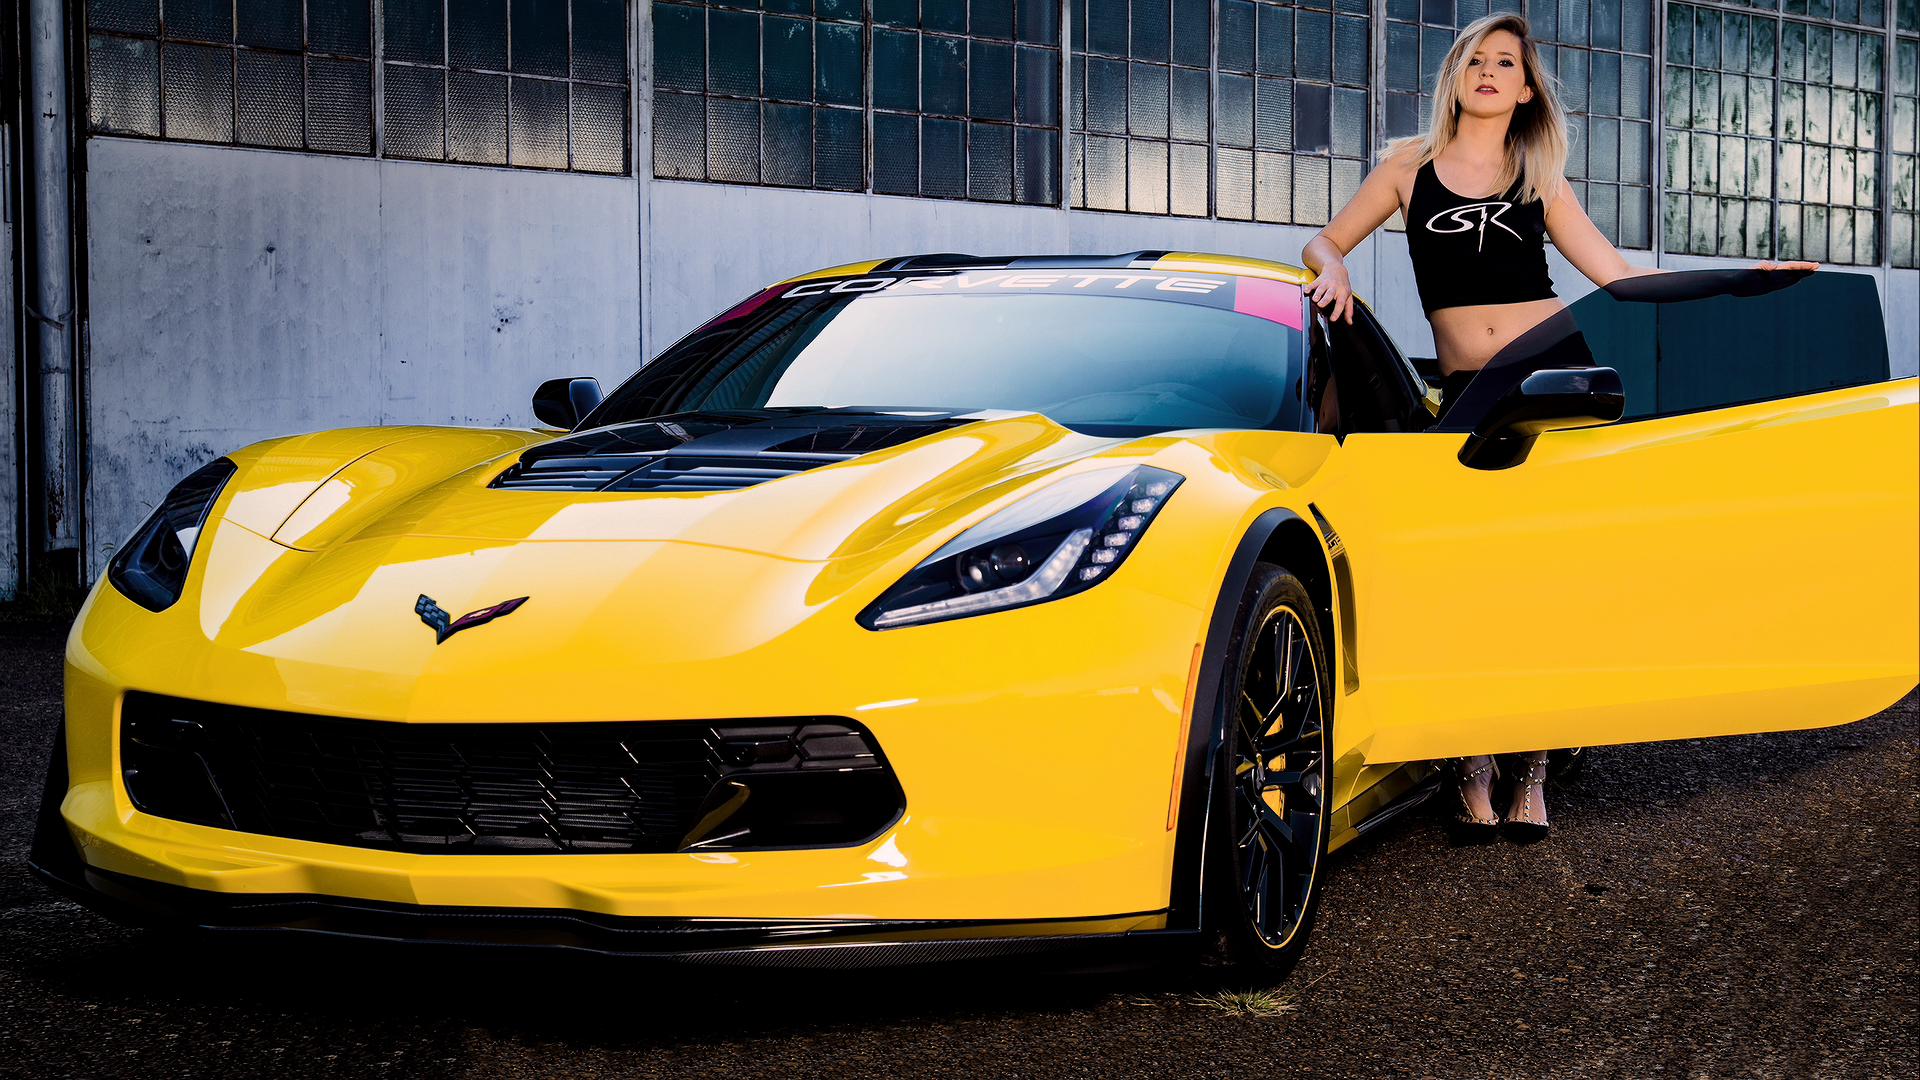 Kelebihan Corvette C7 Z06 Top Model Tahun Ini